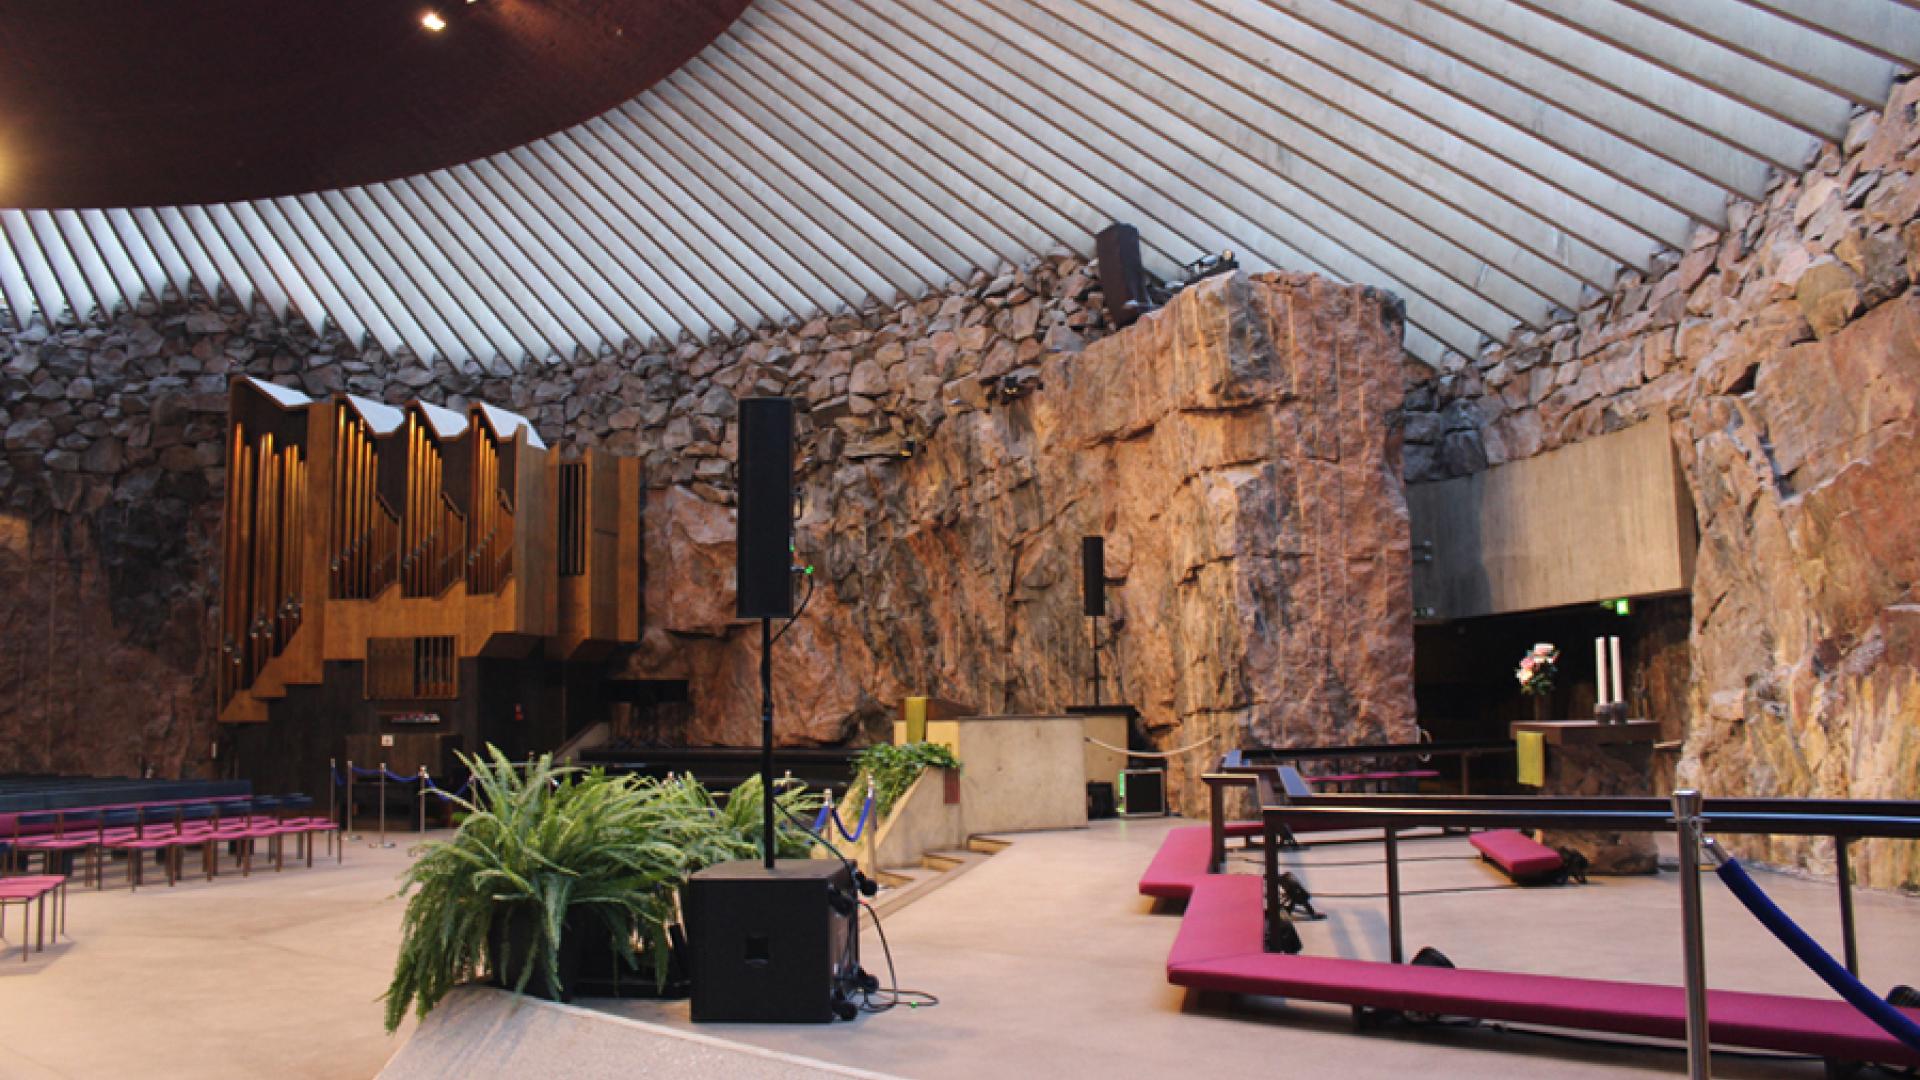 The sacred architecture of Helsinki